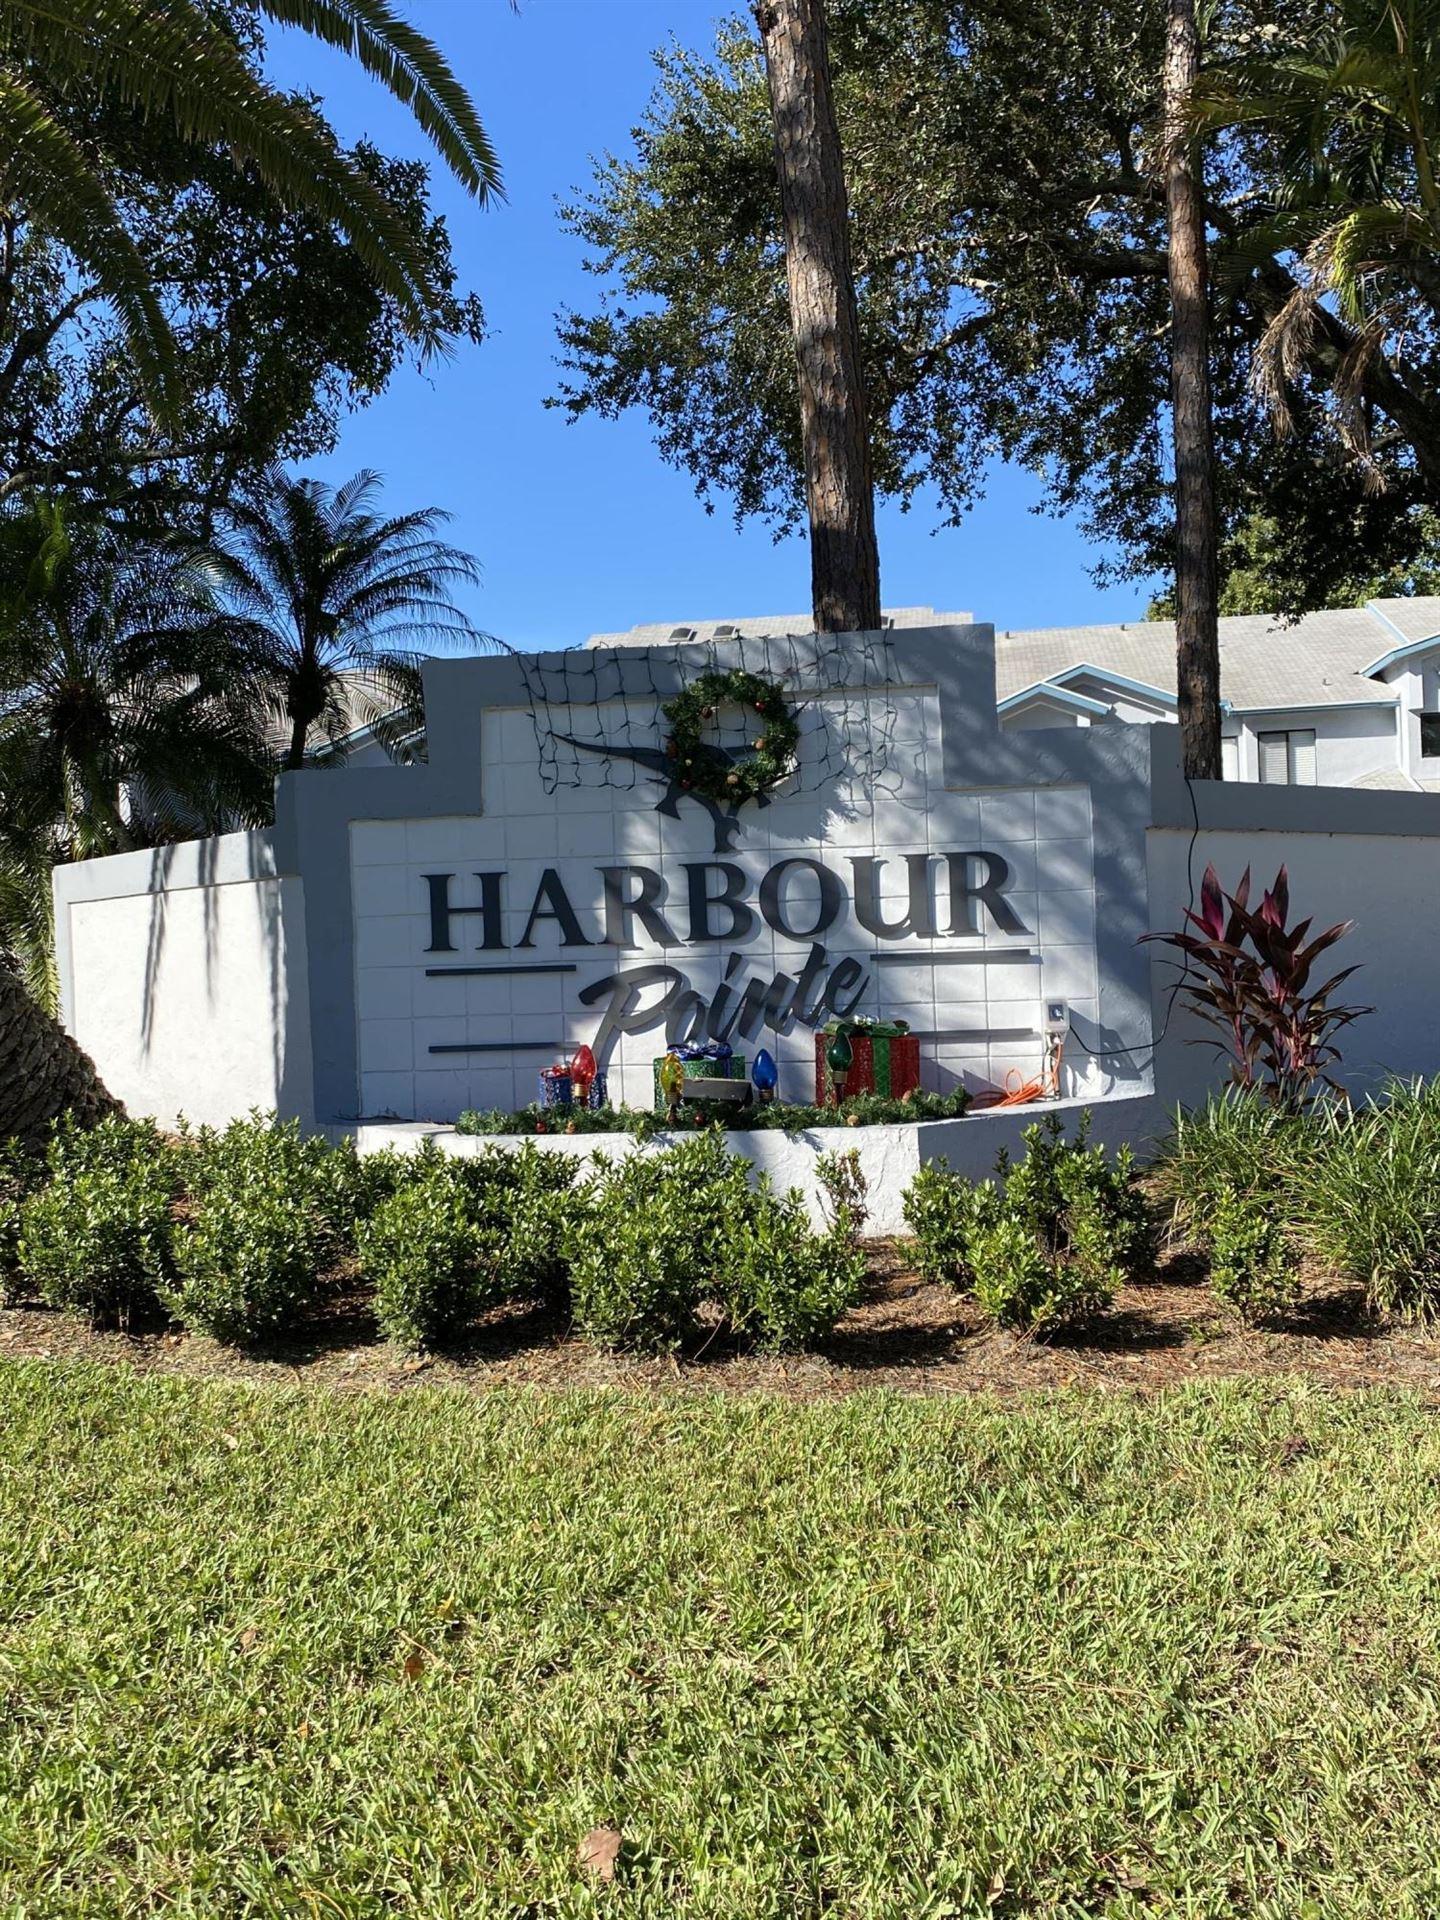 Photo of 101 Harbour Pointe Way #101, Greenacres, FL 33413 (MLS # RX-10679228)